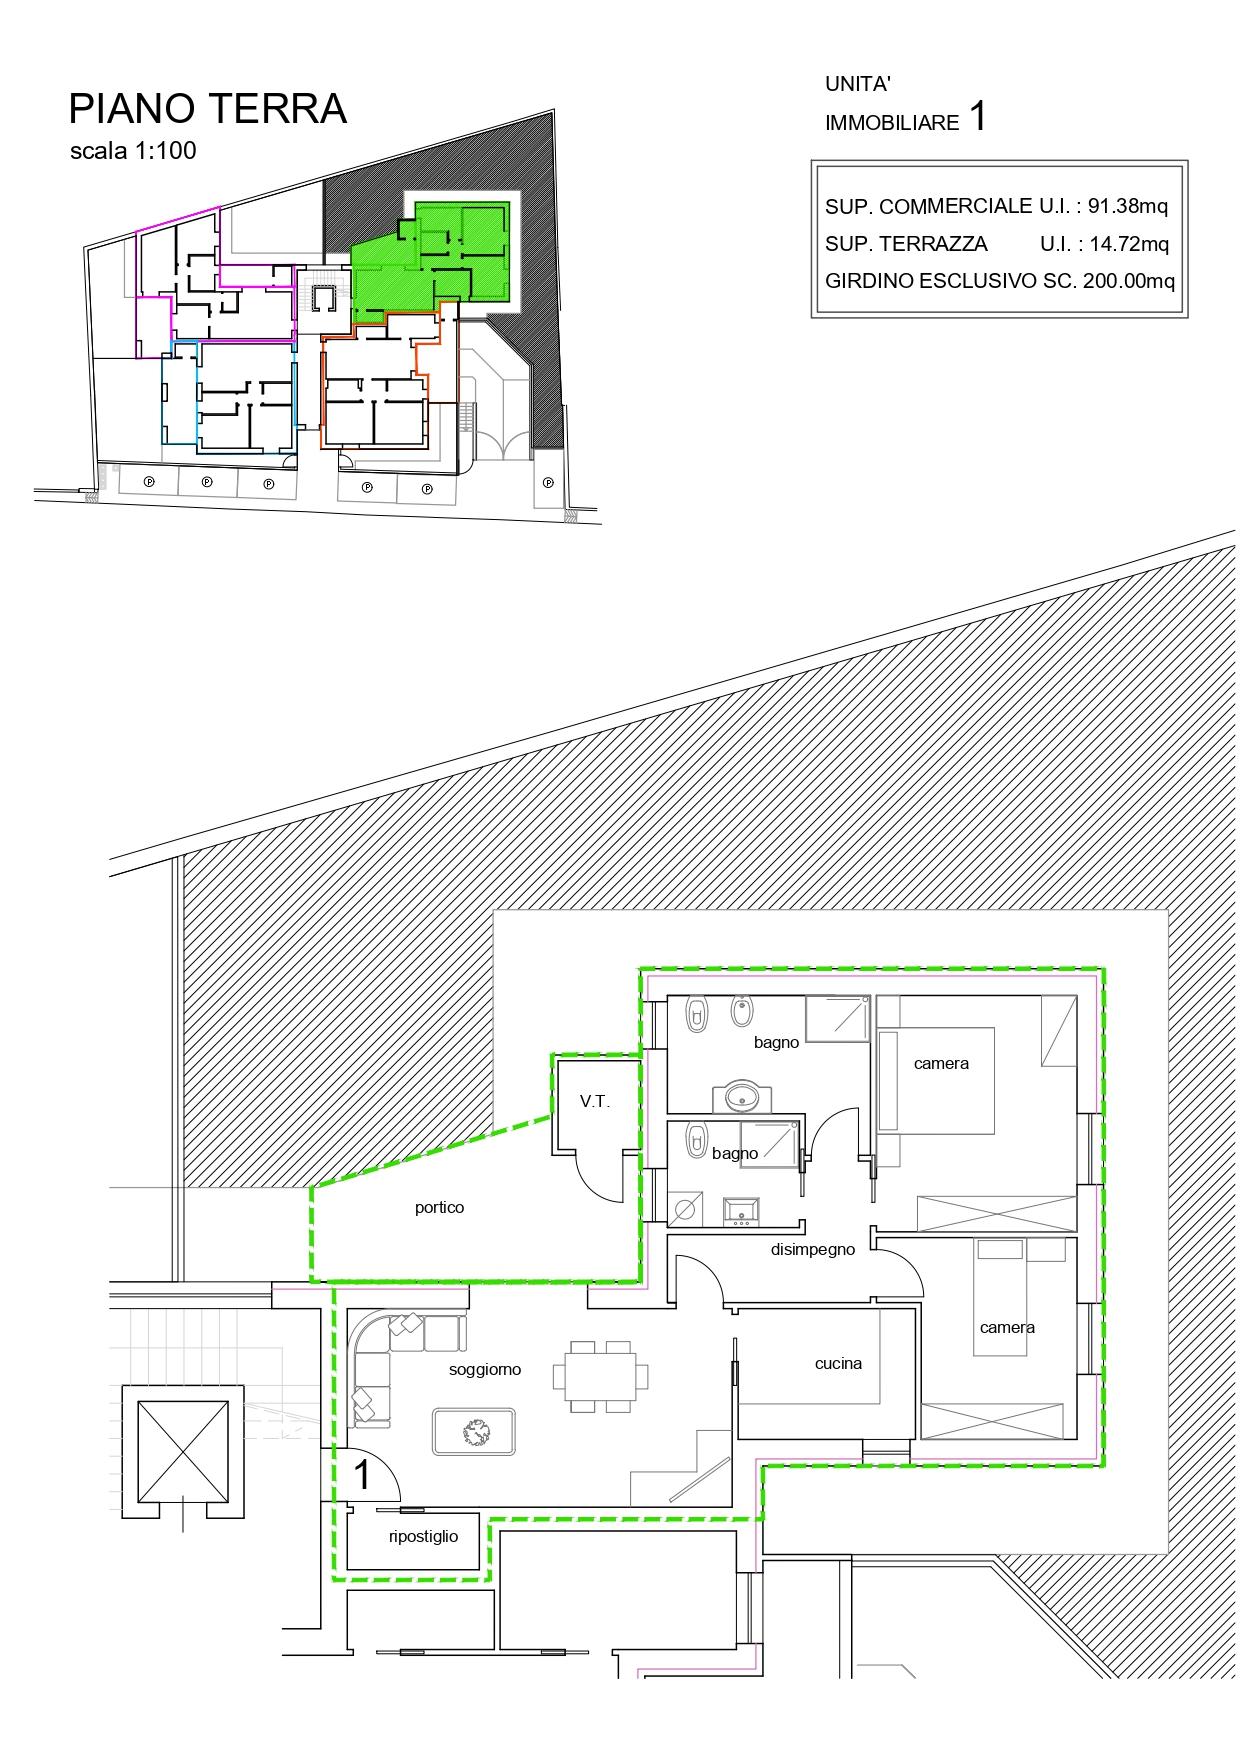 001_Appartamento 1_PT_page-0001